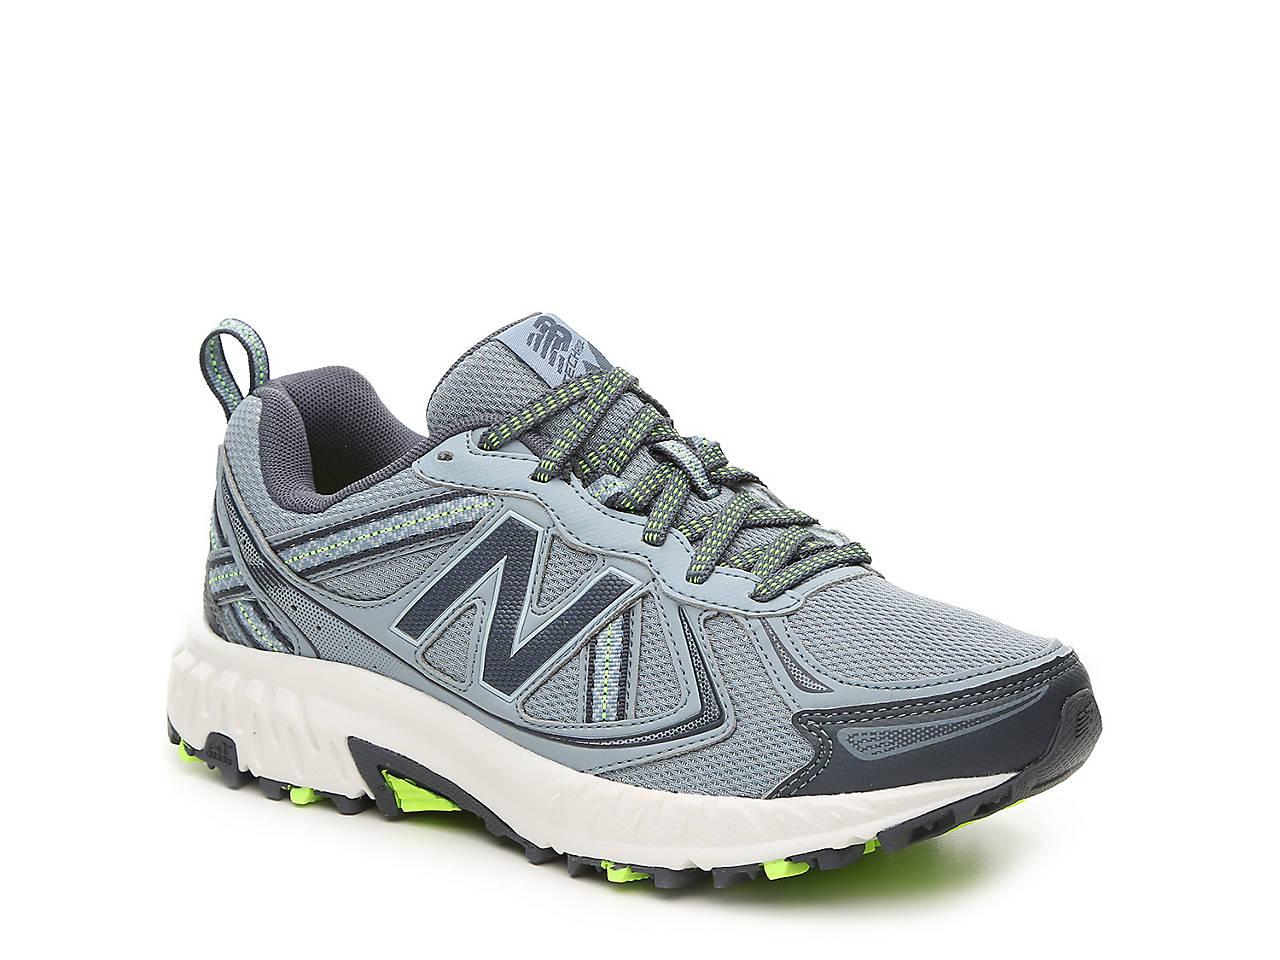 new balance trail running shoes womens. 410 v5 trail running shoe - women\u0027s new balance shoes womens